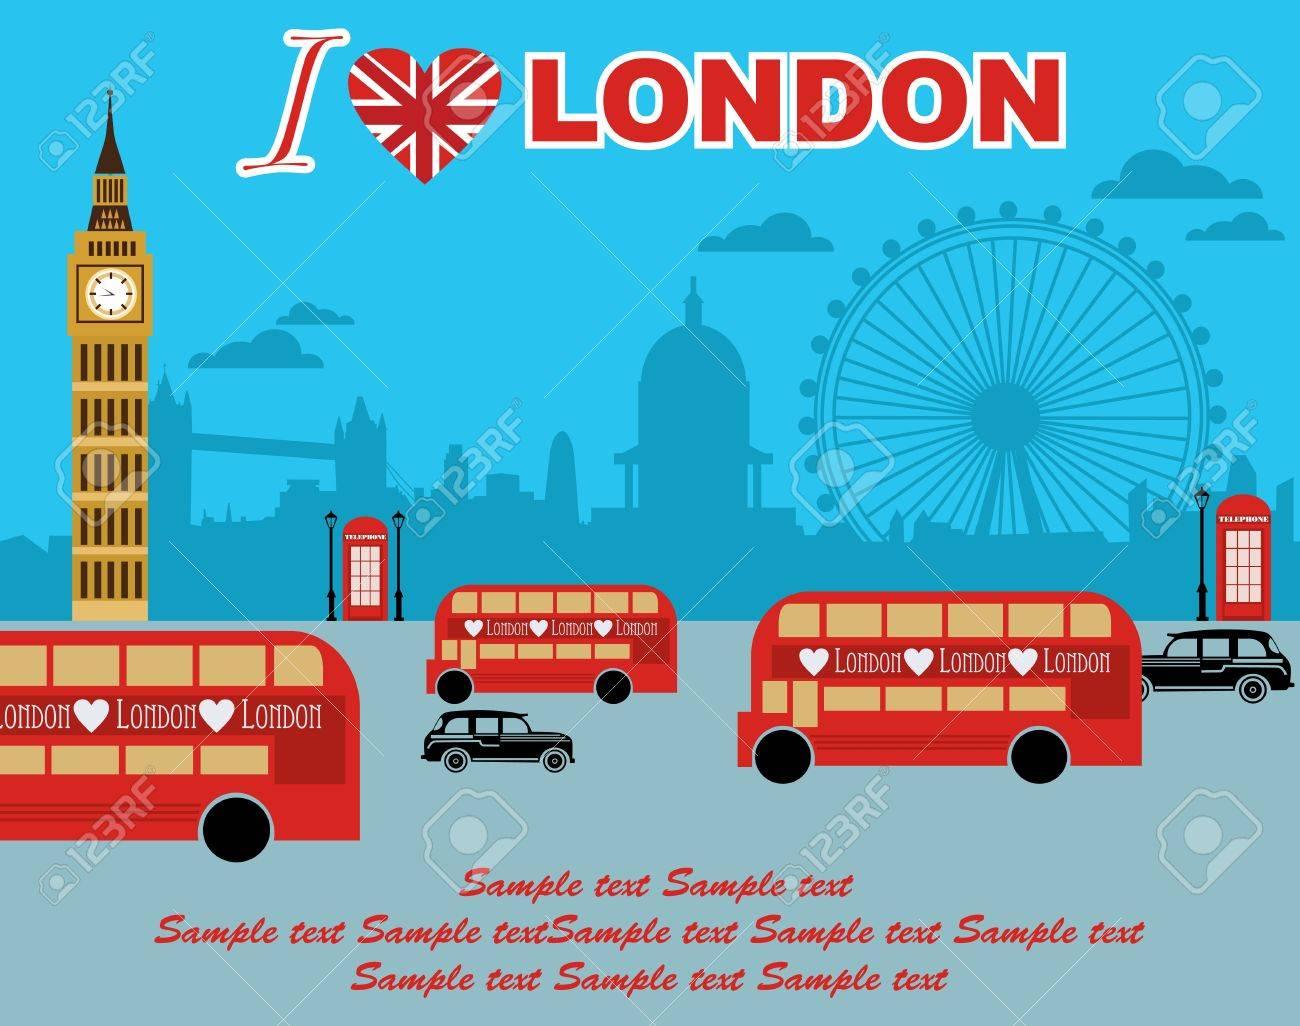 I love London card design. vector illustration Stock Vector - 19252403